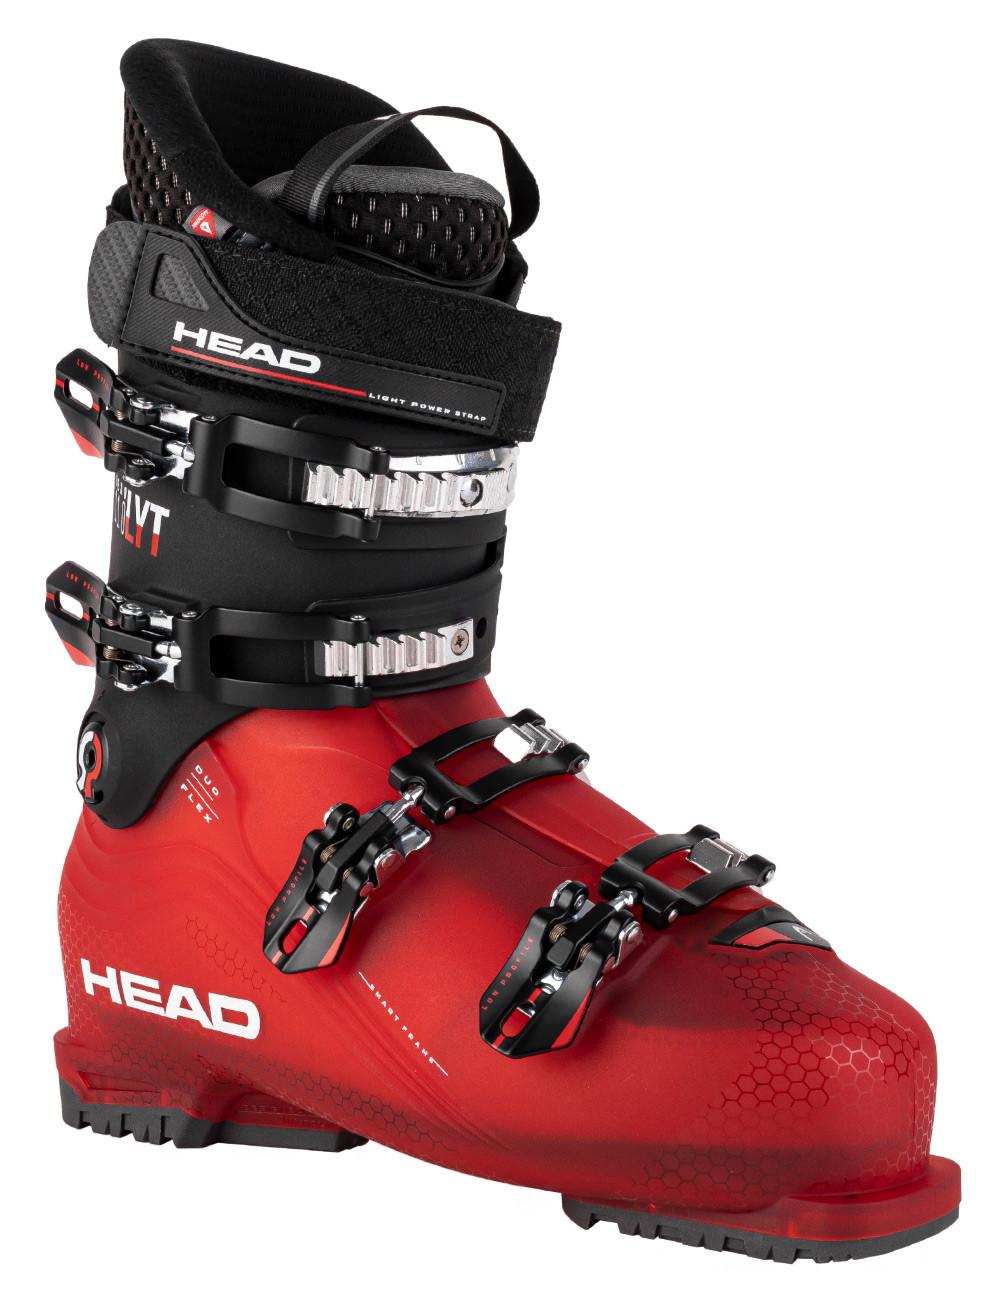 Buty narciarskie Head Nexo Lyt 110 HT